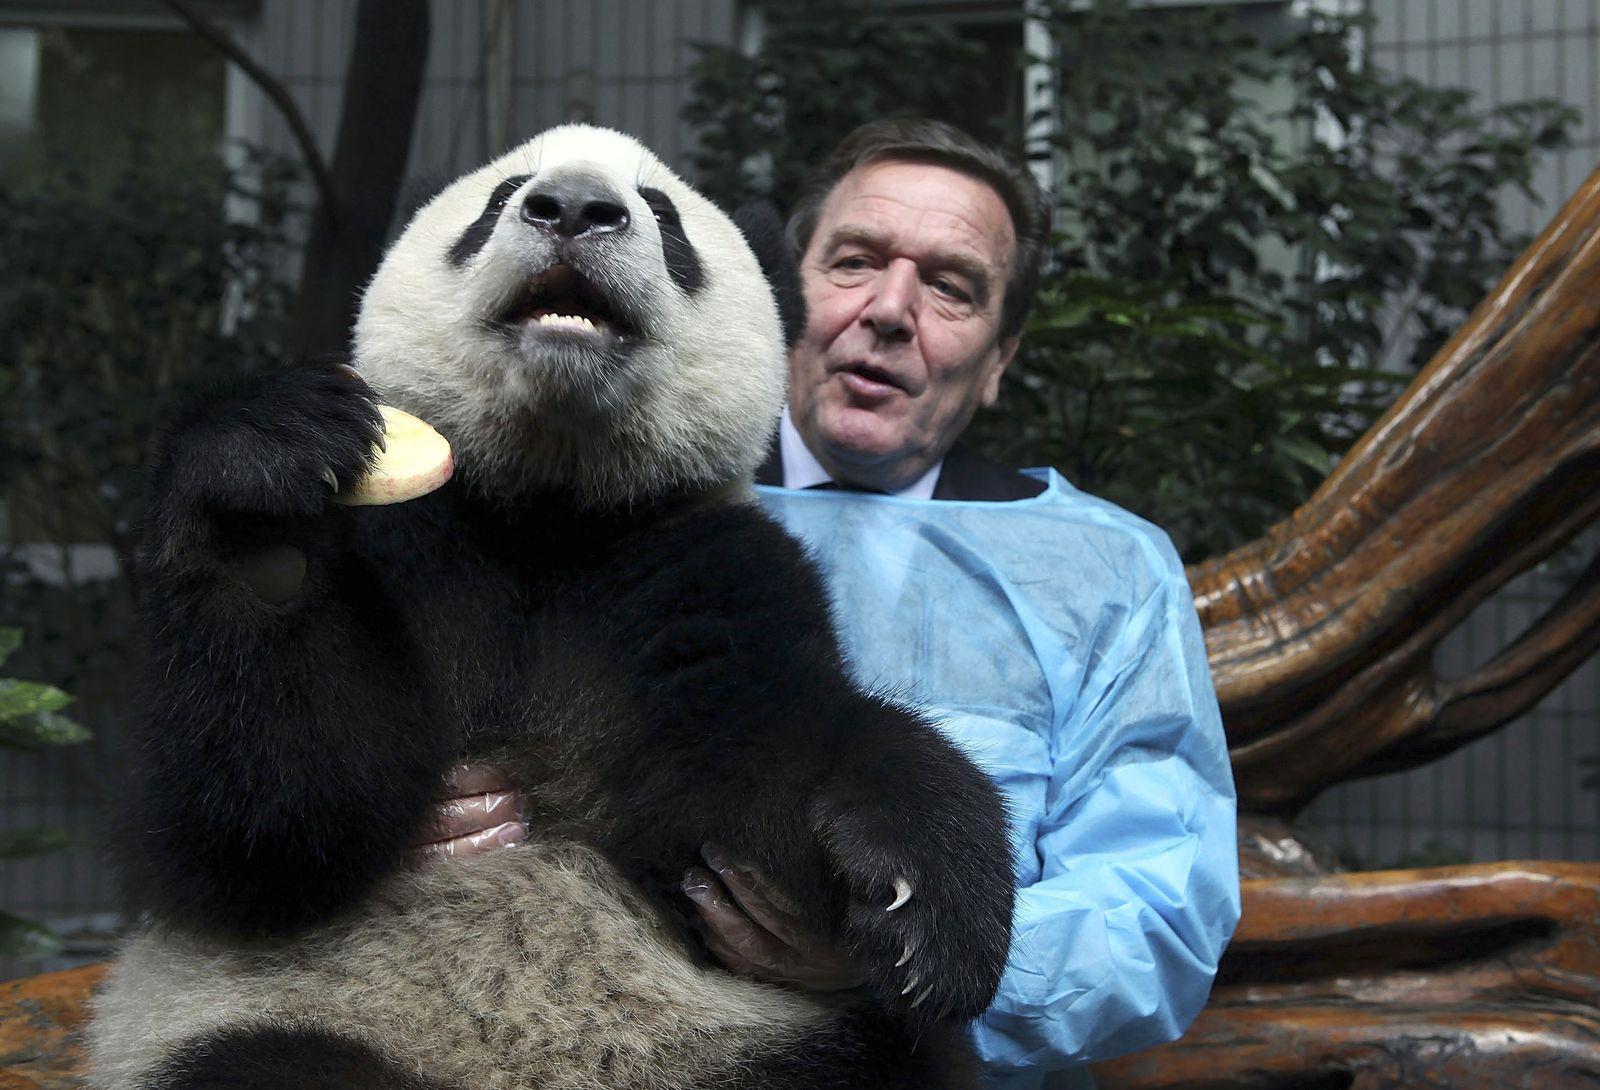 Gerhard Schröder / Panda / Zoo / Chengdu